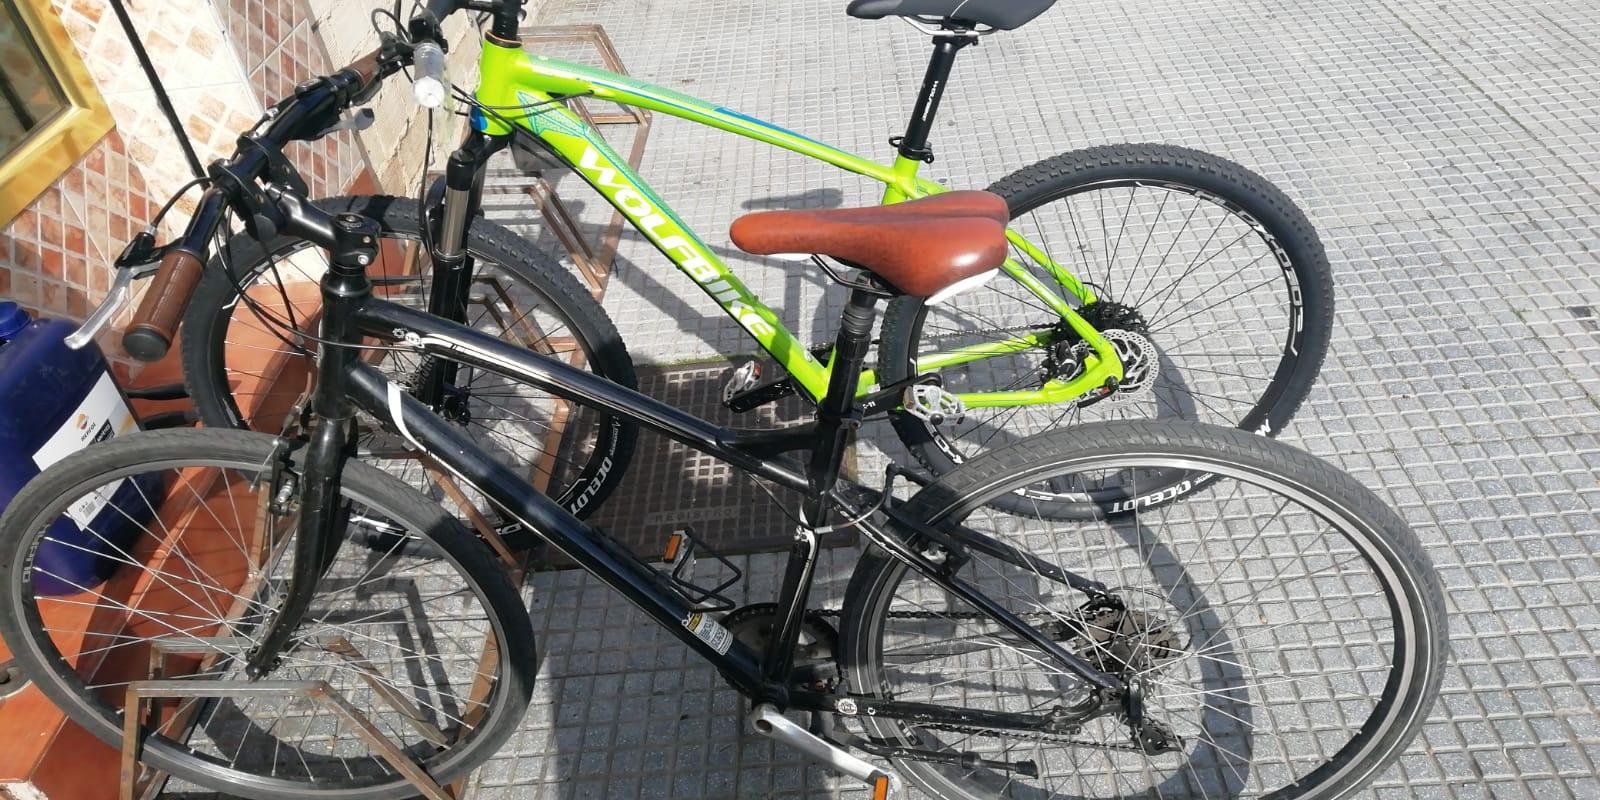 alquiler de bicis en punta umbria Bermejo 001